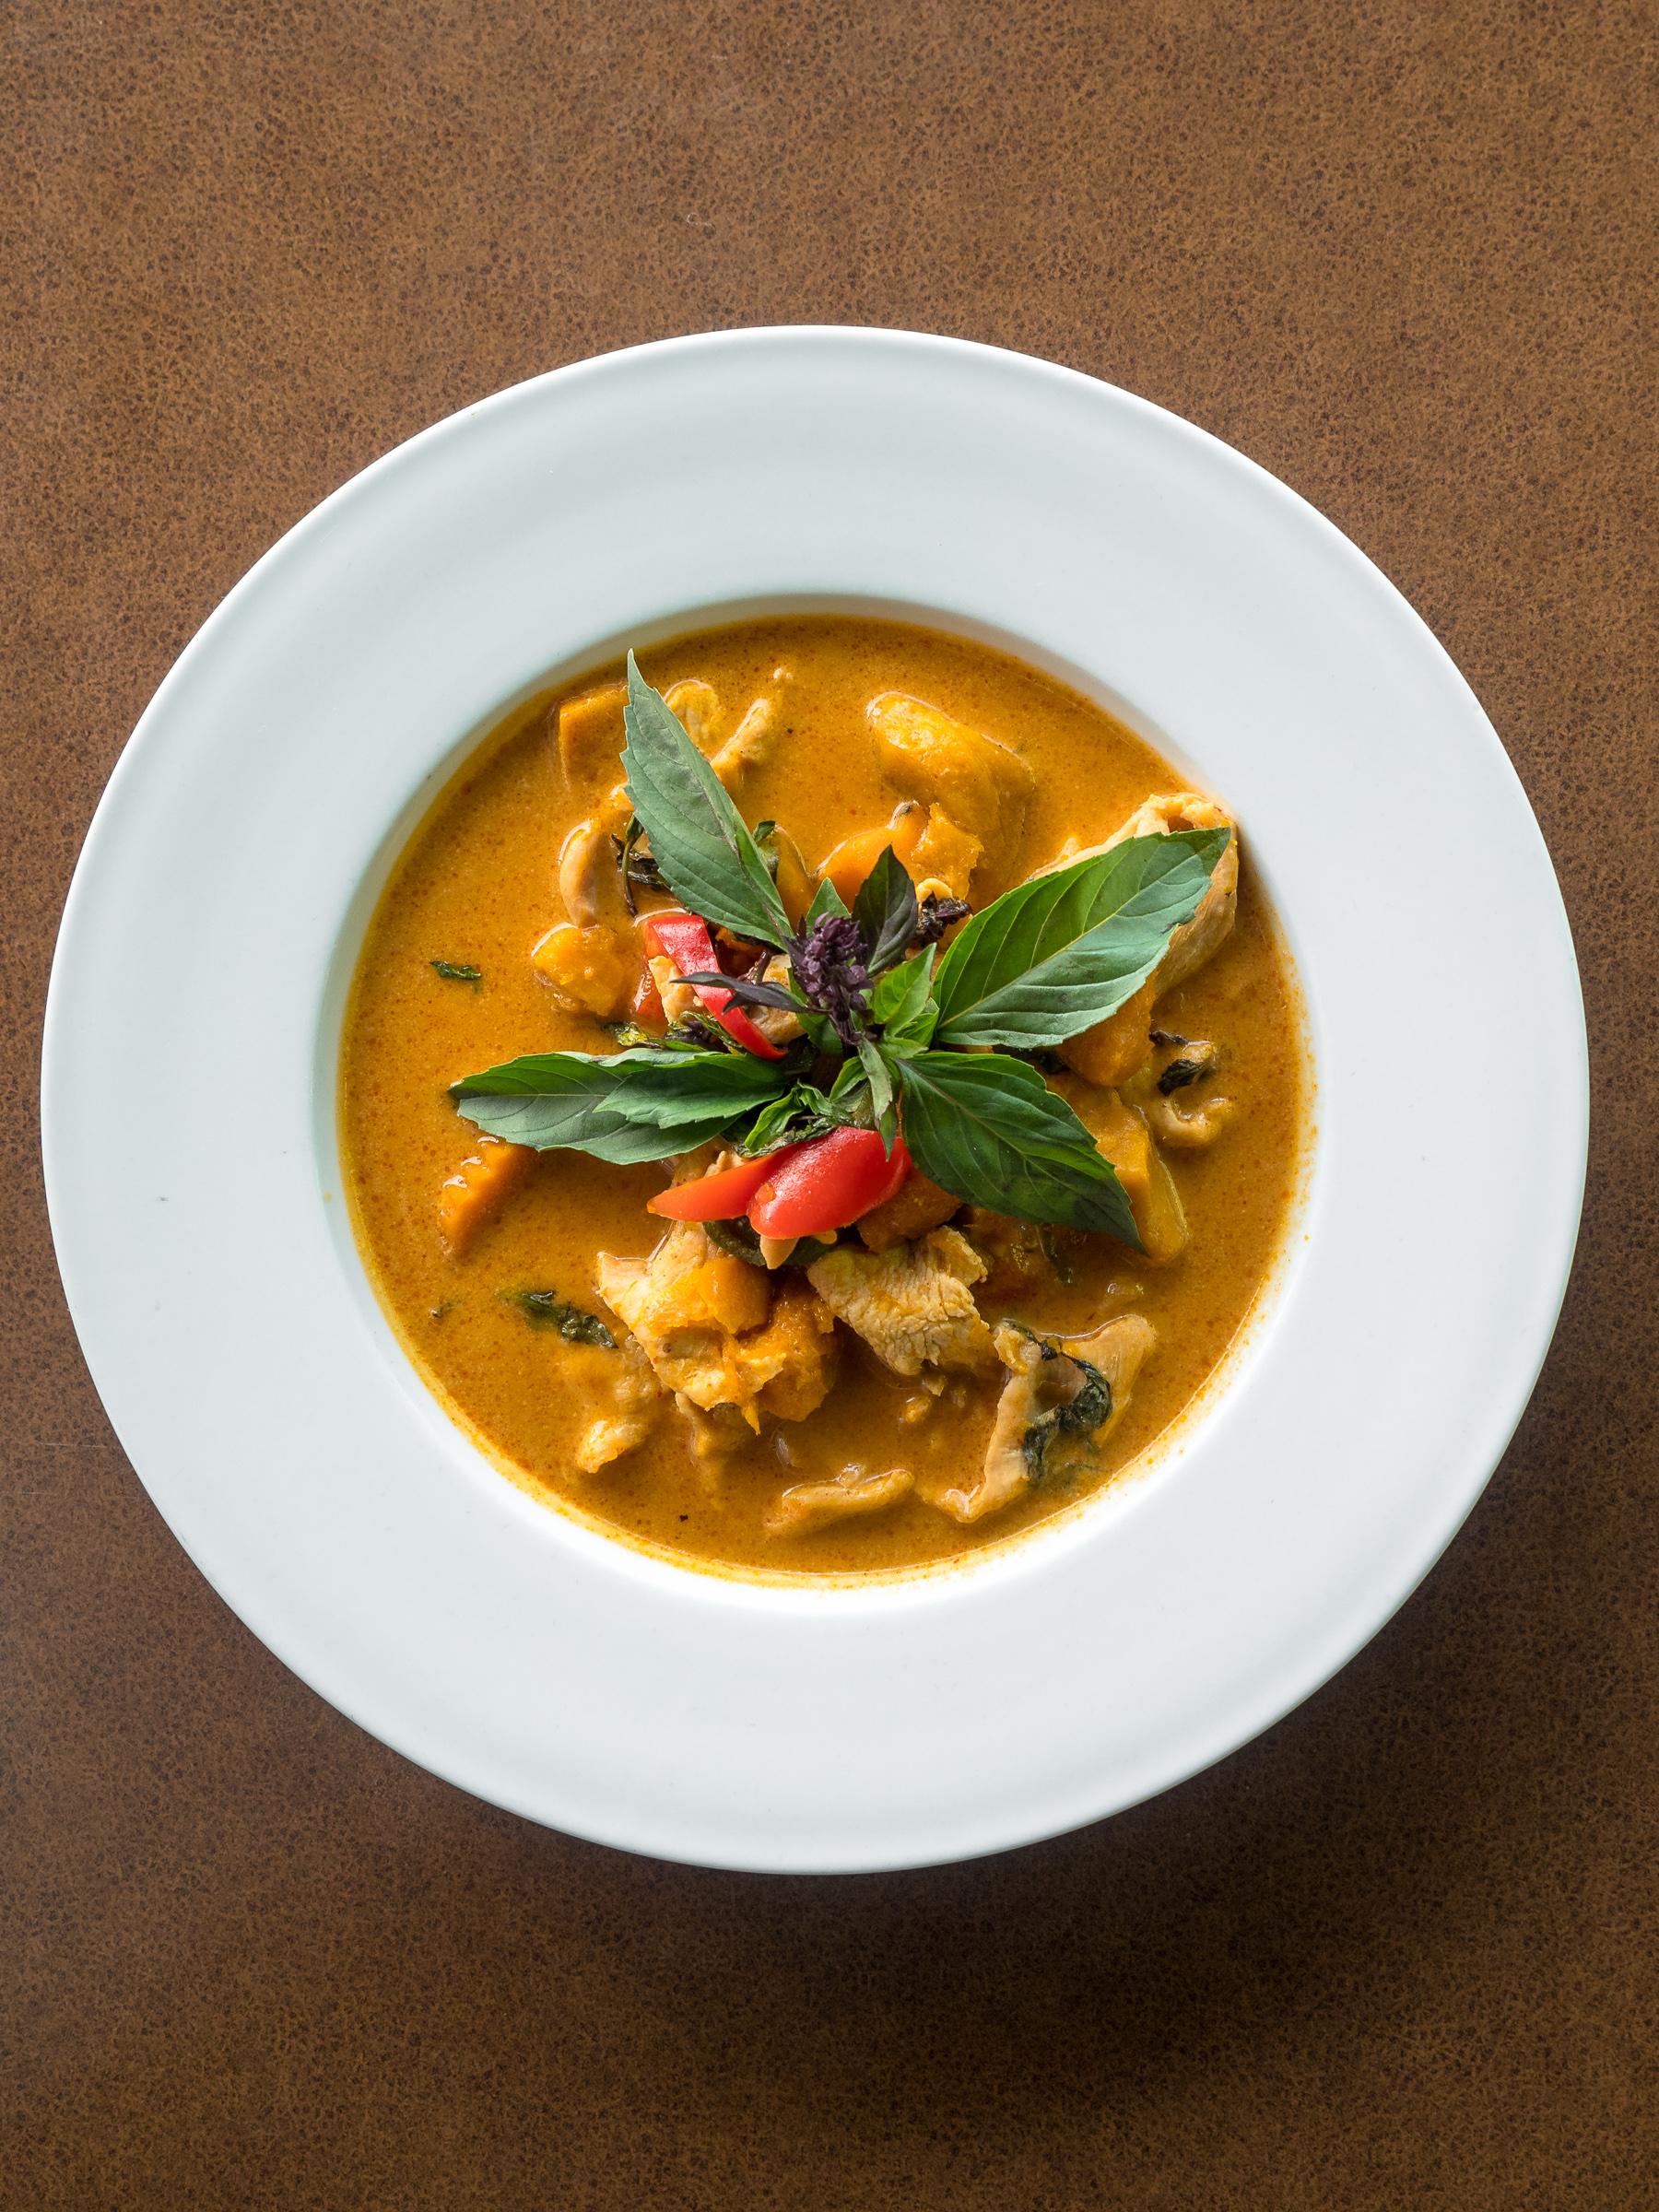 classic thai cuisine jeremy pawlowski portland oregon texas food photographer photography restaurant red curry